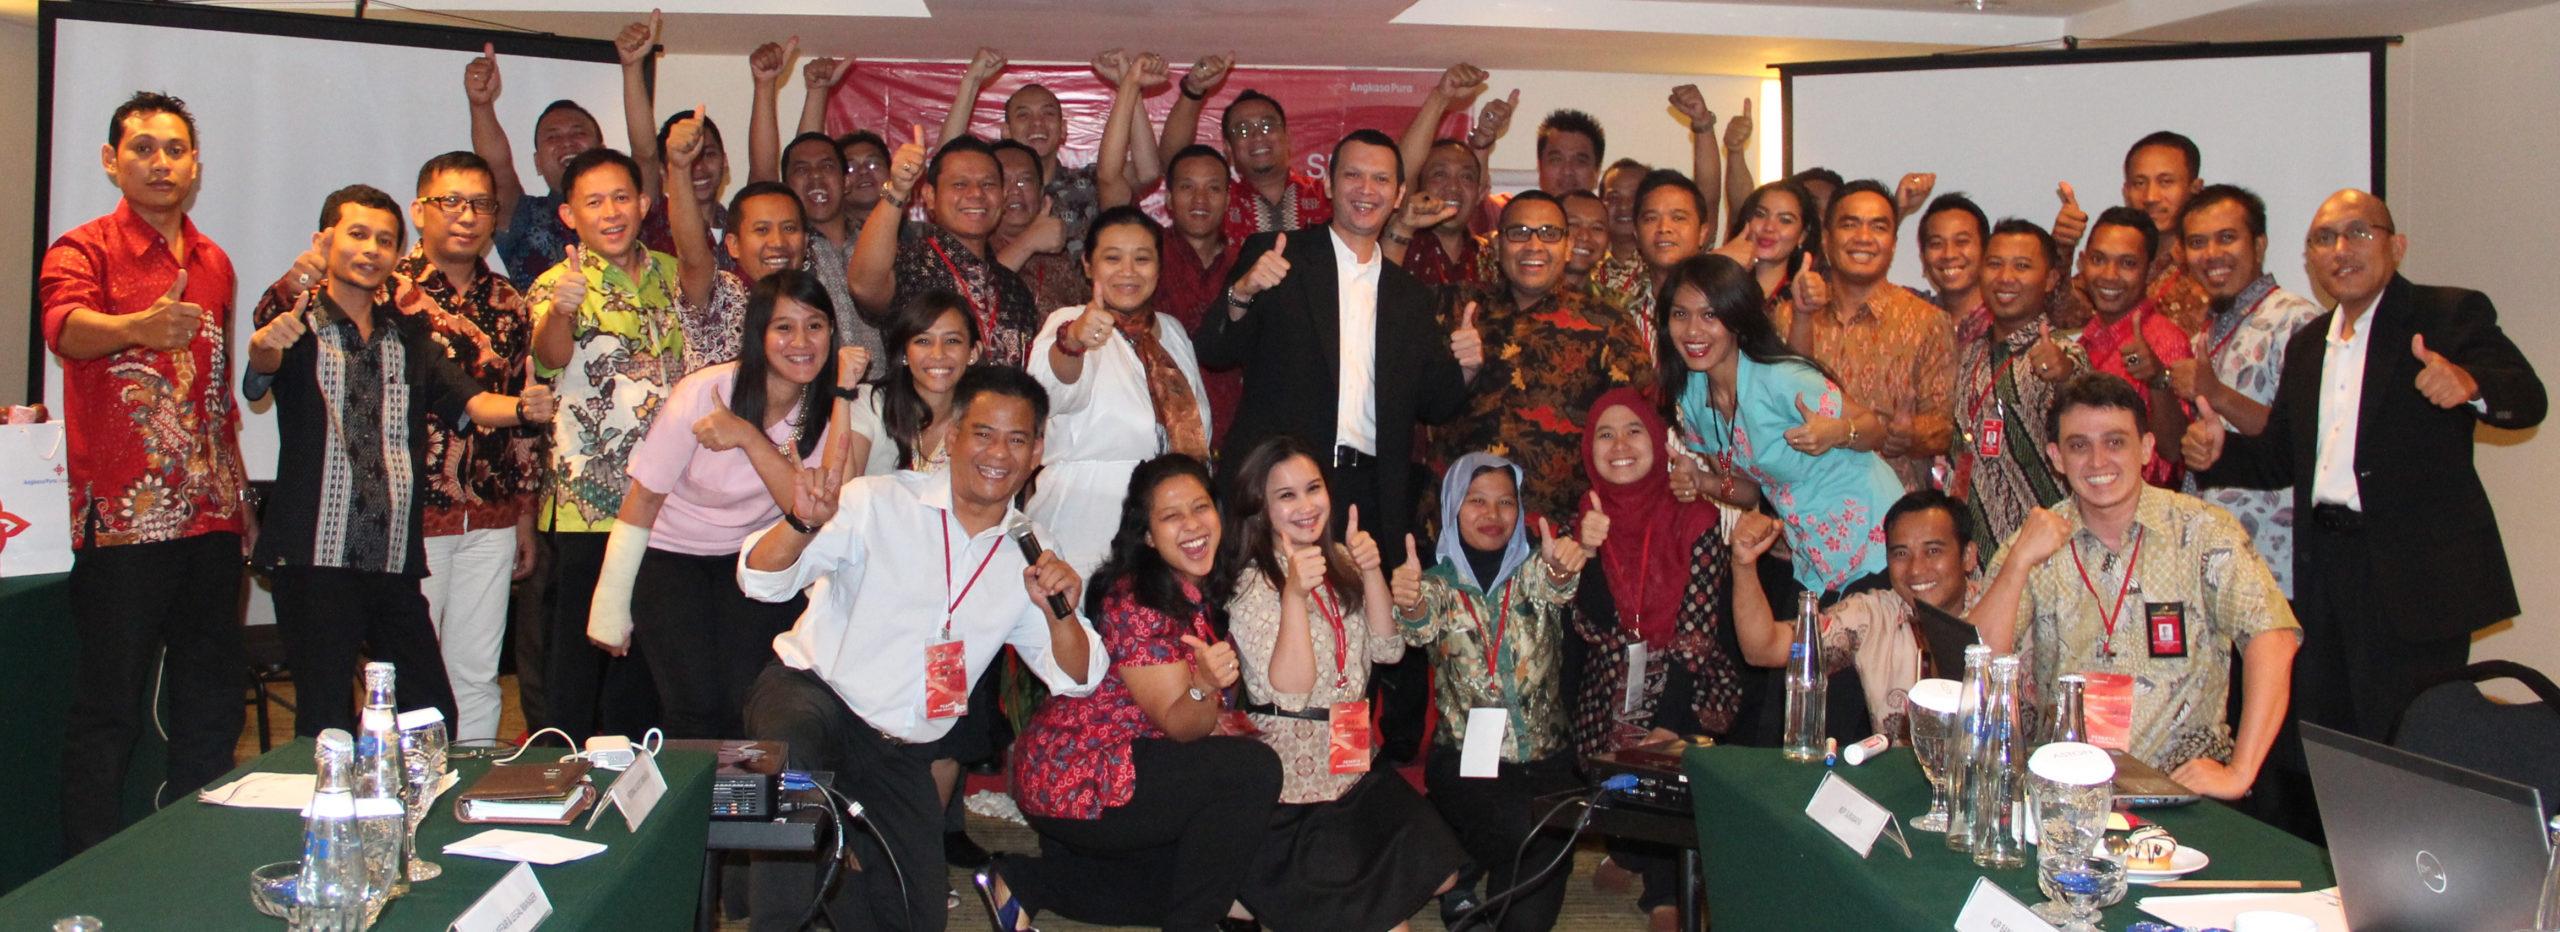 Business Model Angkasa Pura Support - 2016